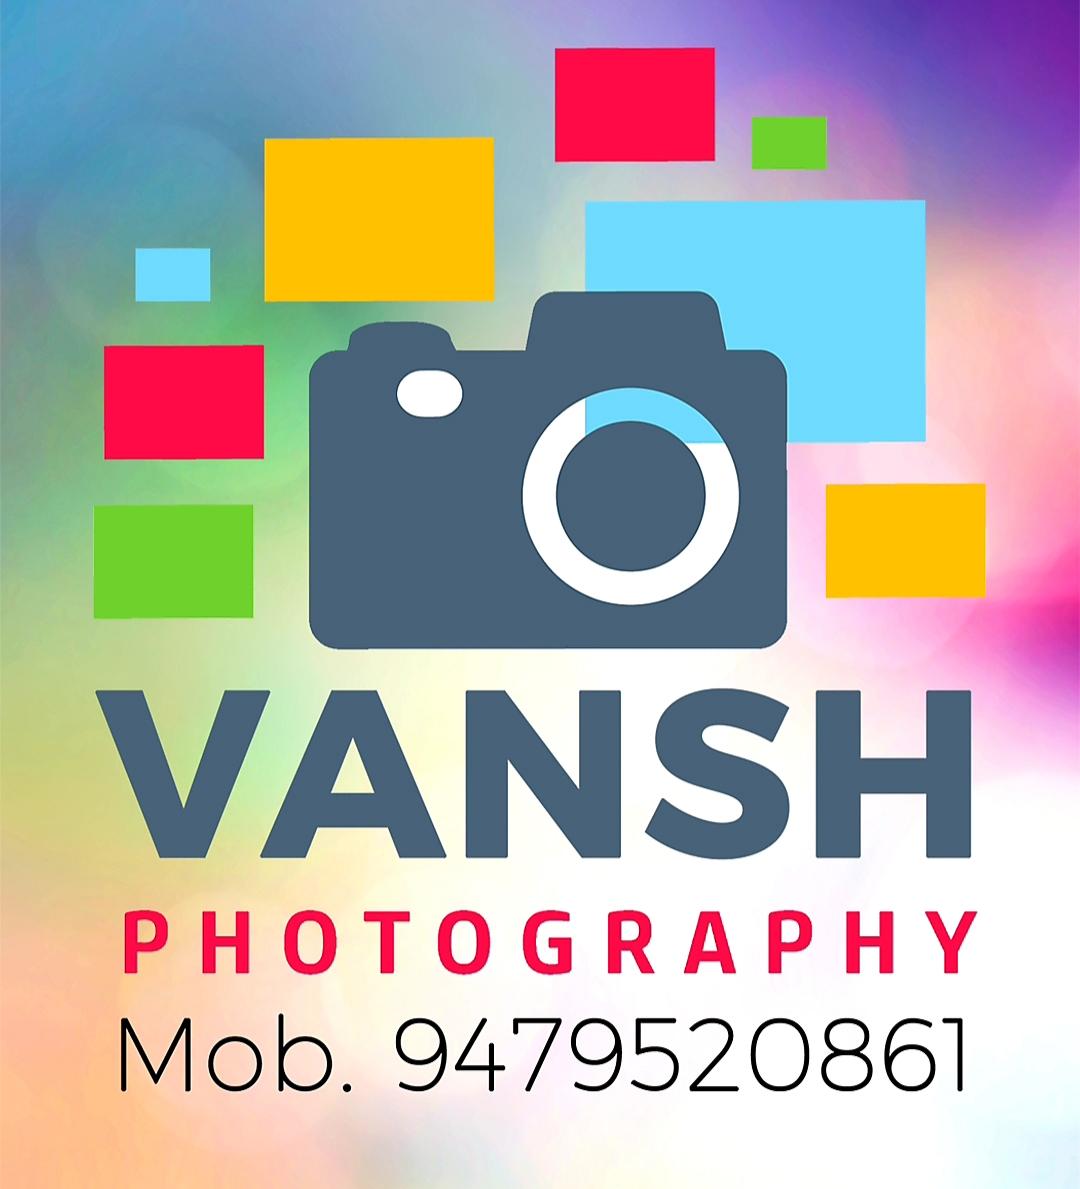 Vansh photography